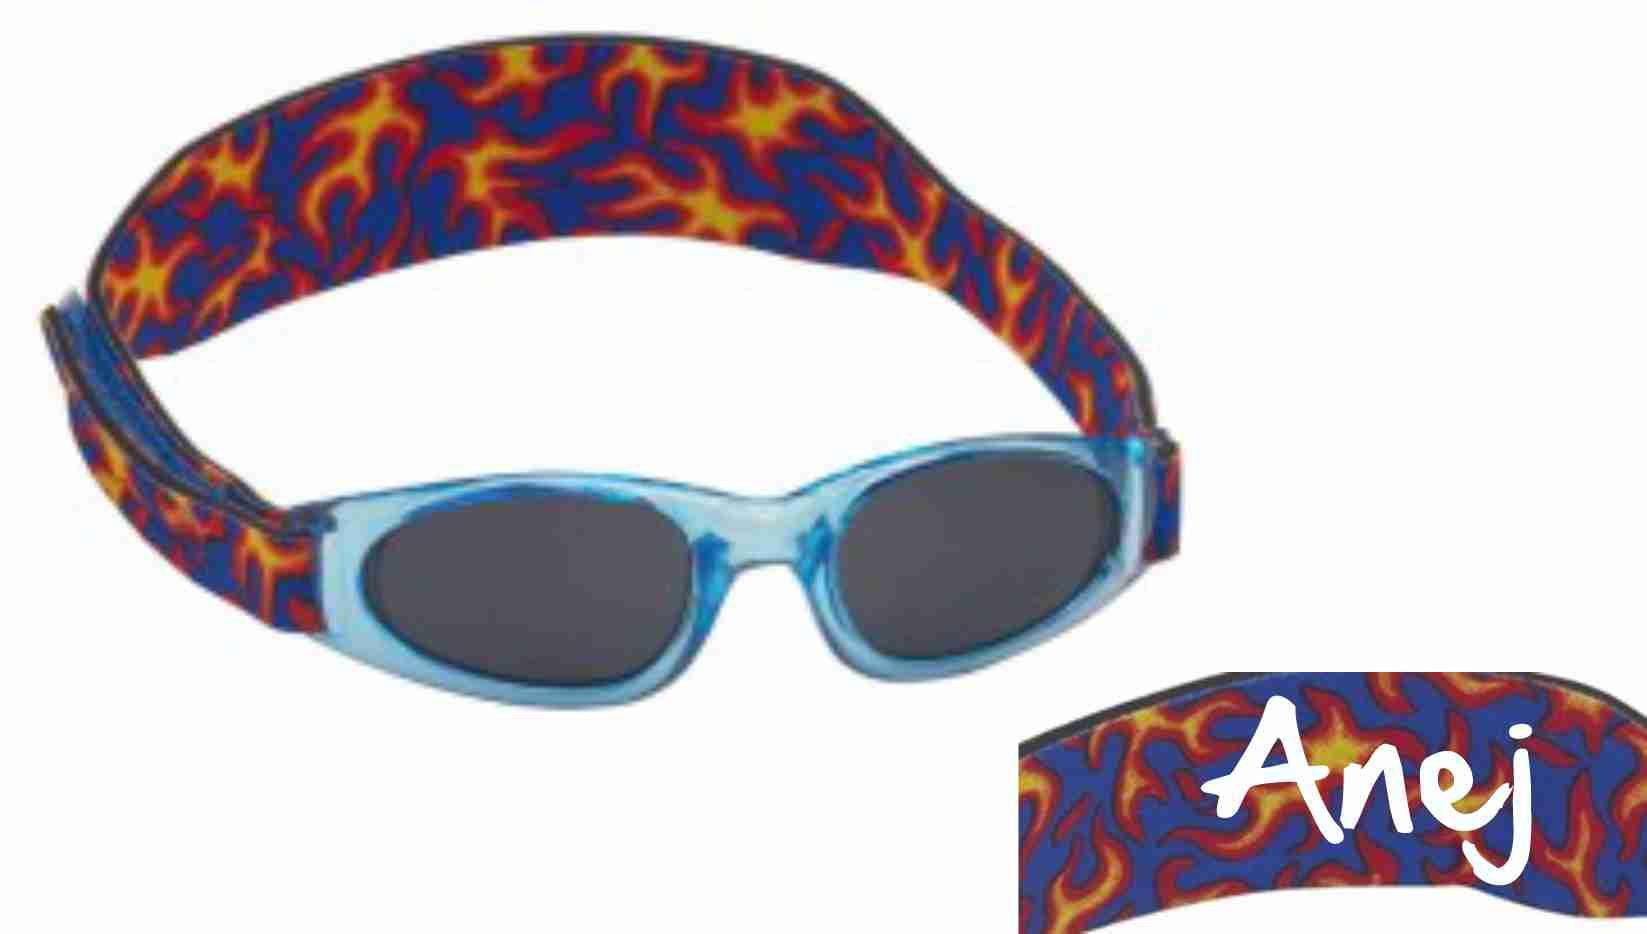 Sunglasses RKS Blue Flame (2-5 years)